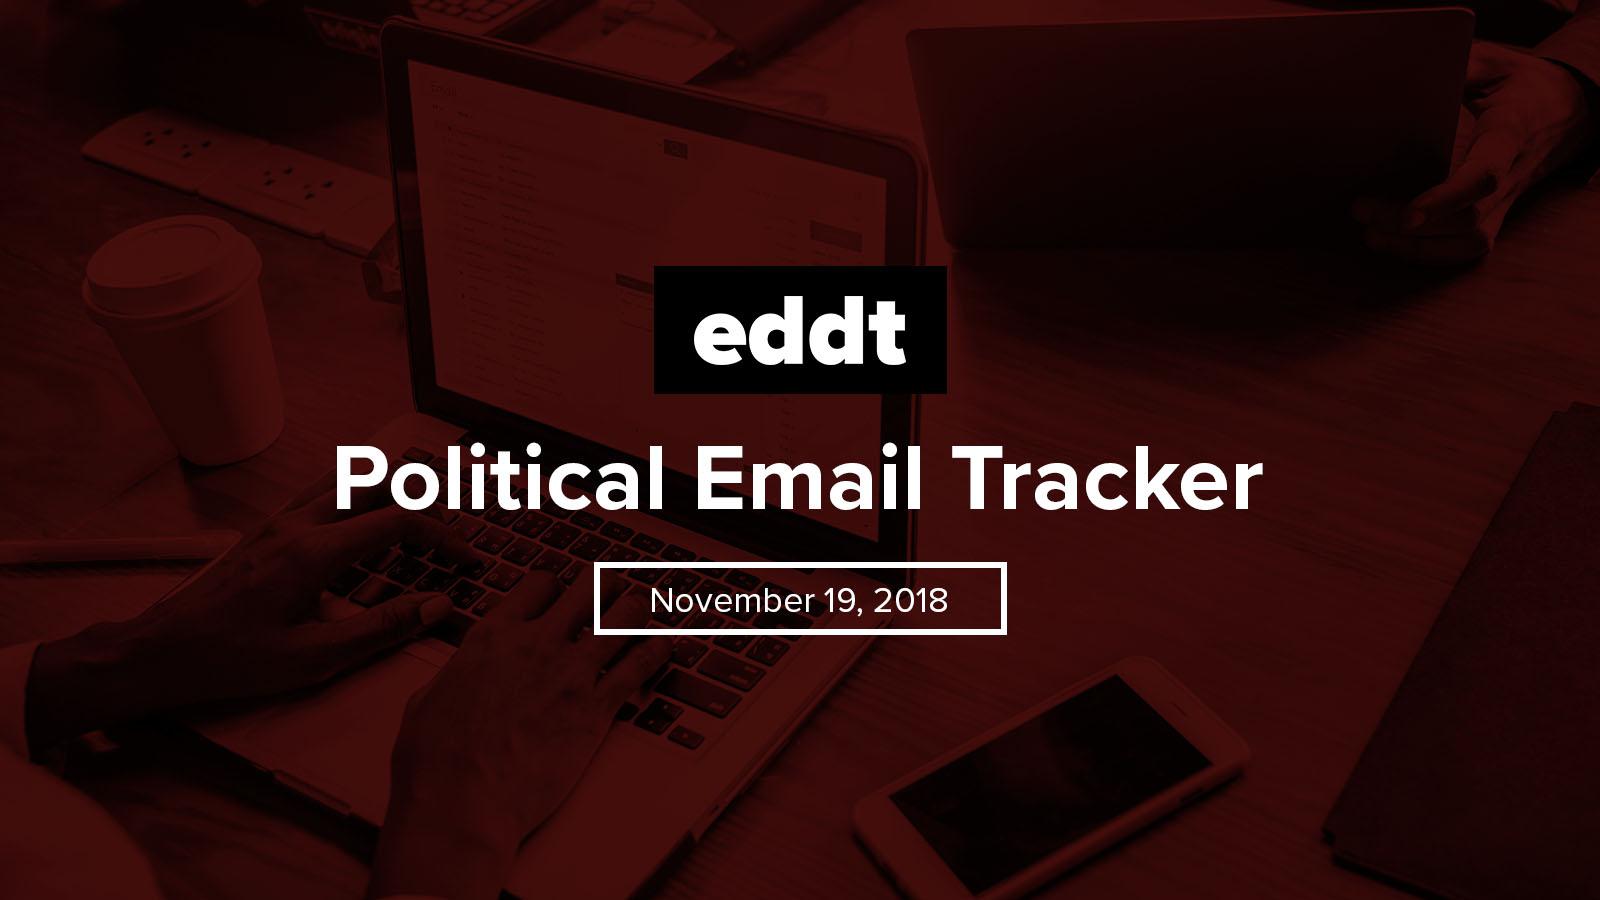 Political Email Tracker - November 19, 2018